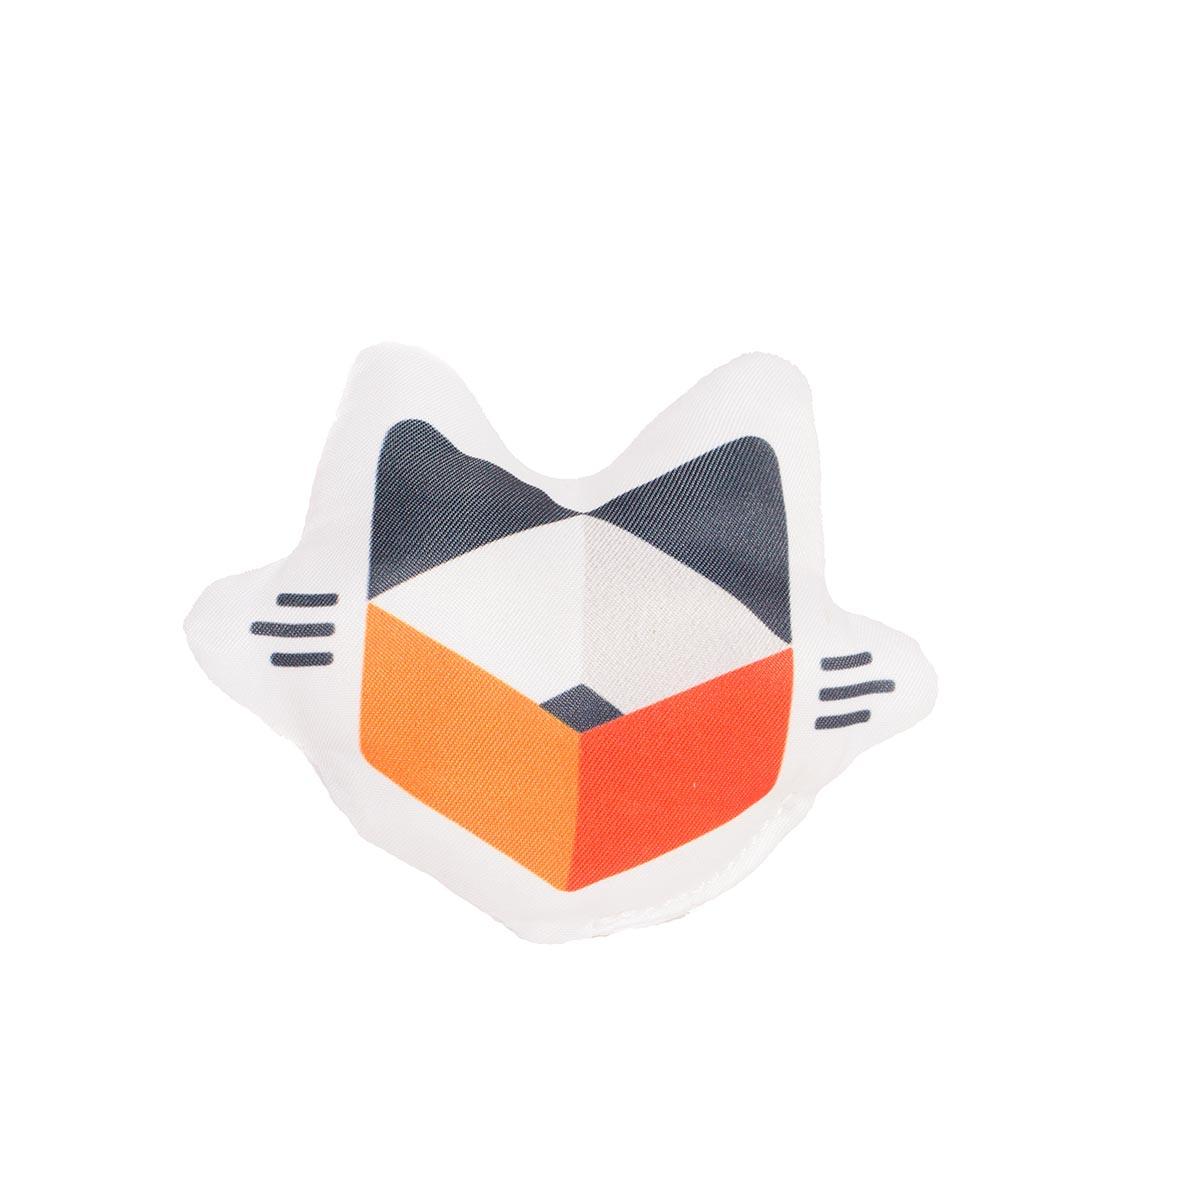 meowbox Logo Catnip Toy